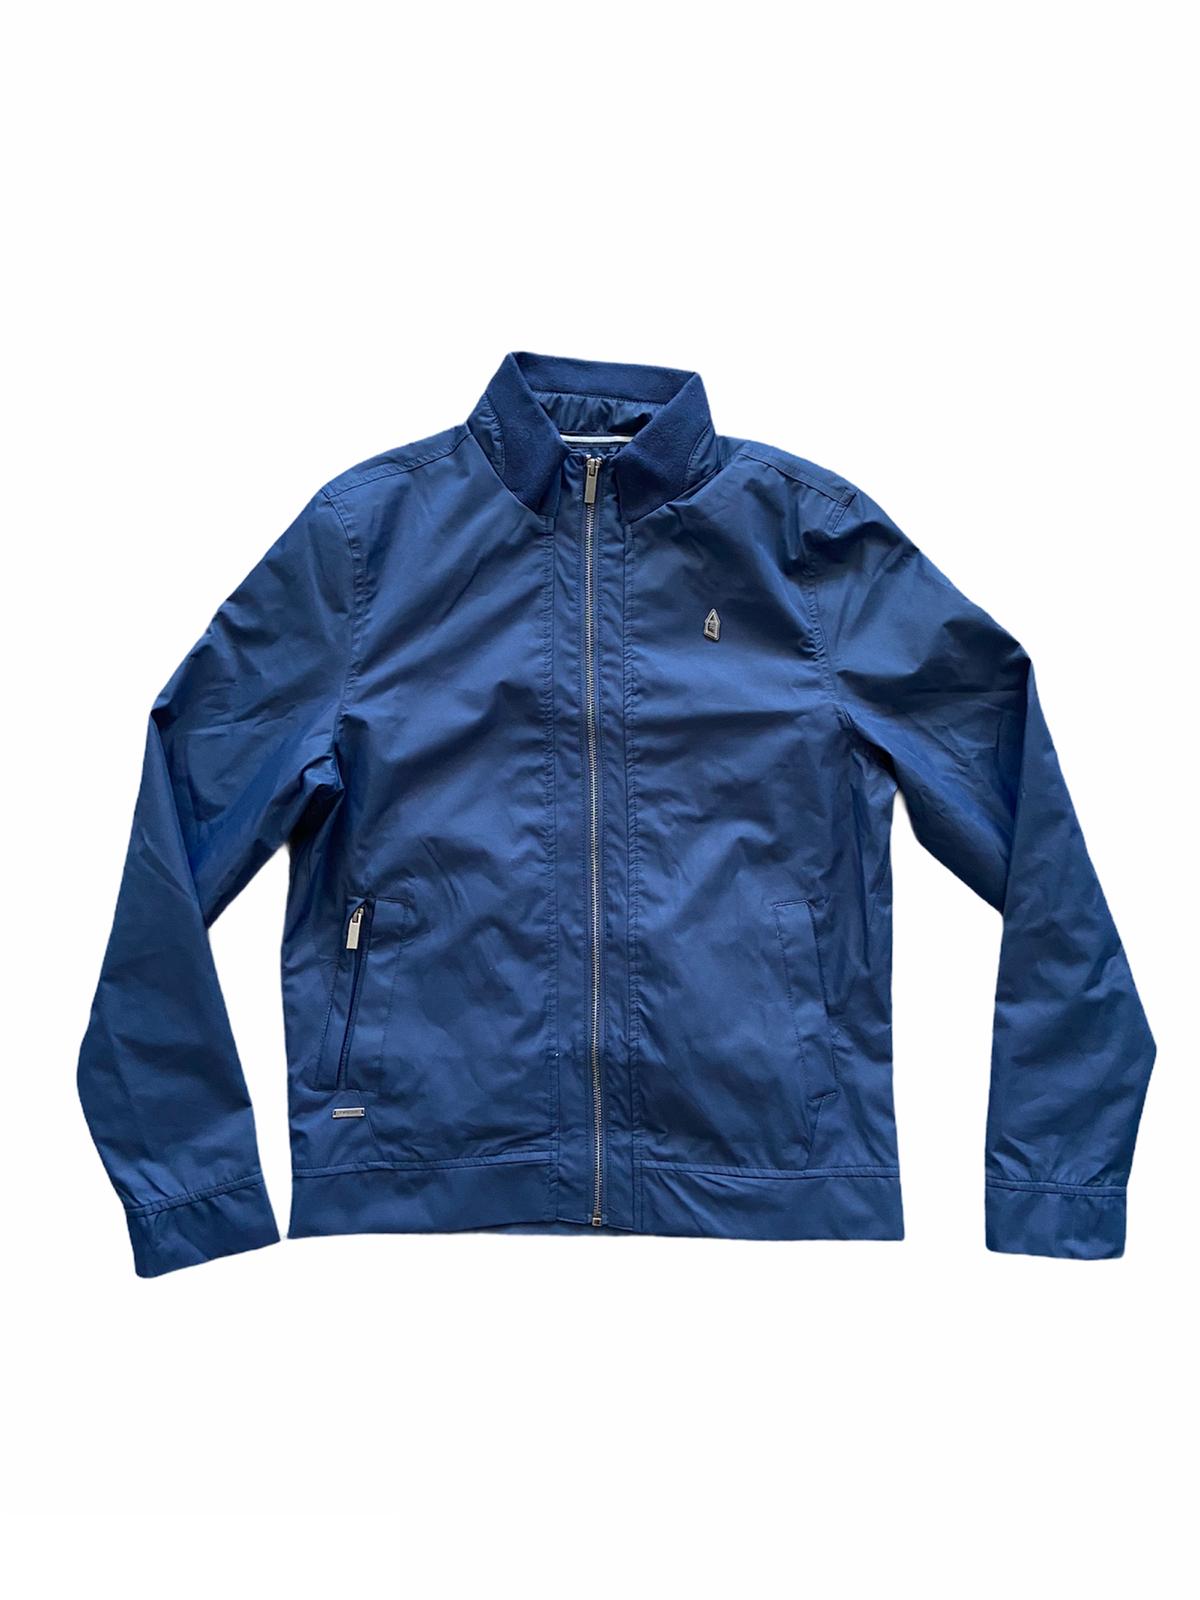 Everton Football Jacket Men's Metal Crest Casual Jacket - Navy - New